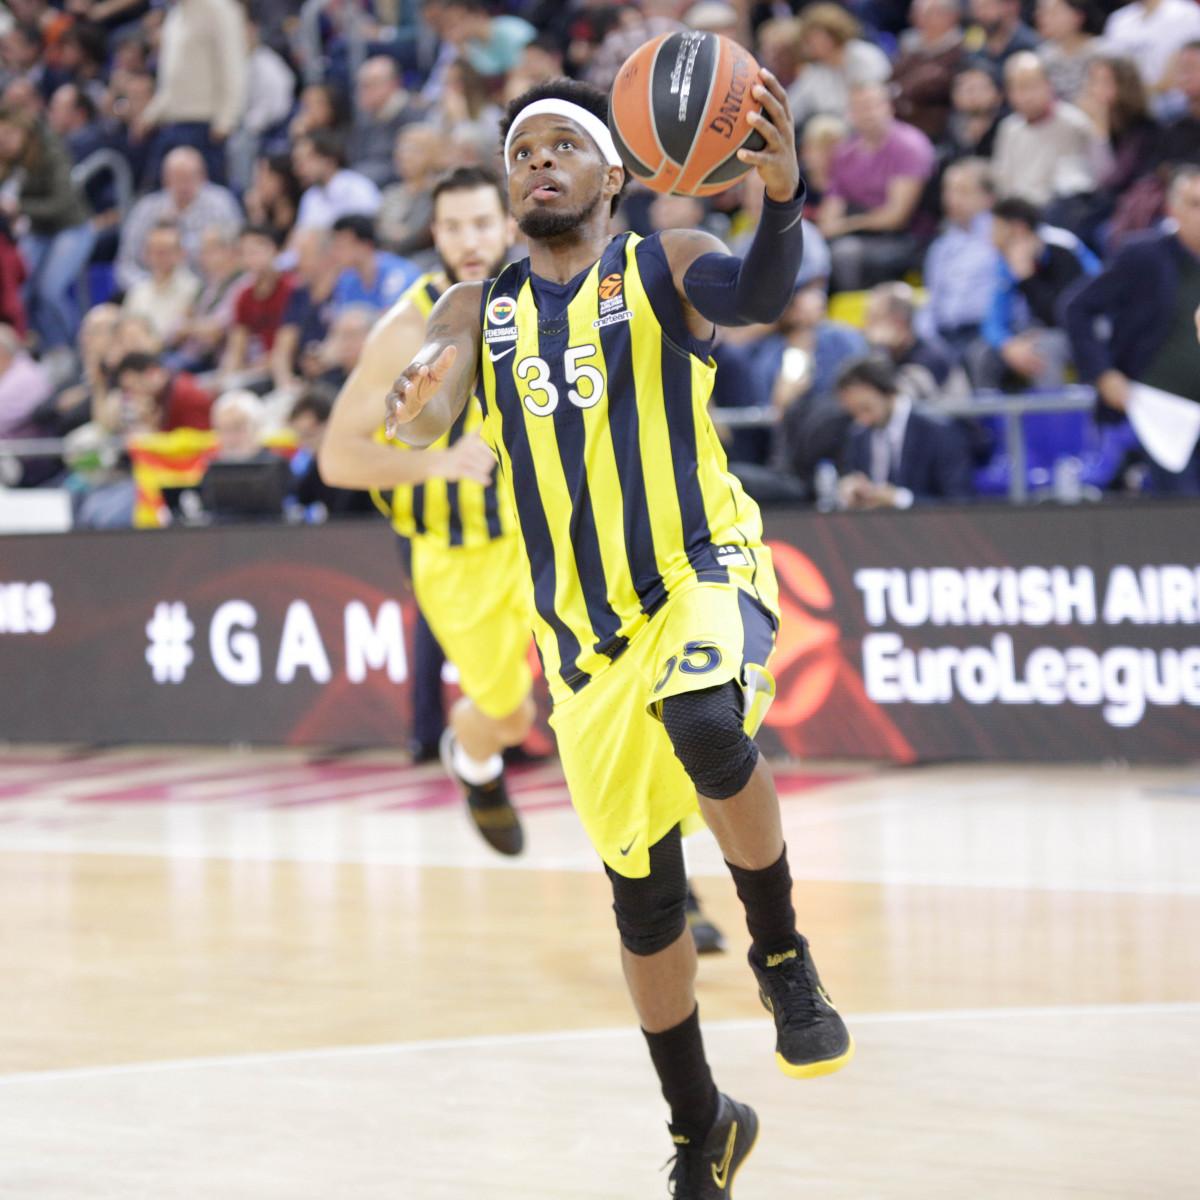 Photo of Ali Muhammed, 2018-2019 season